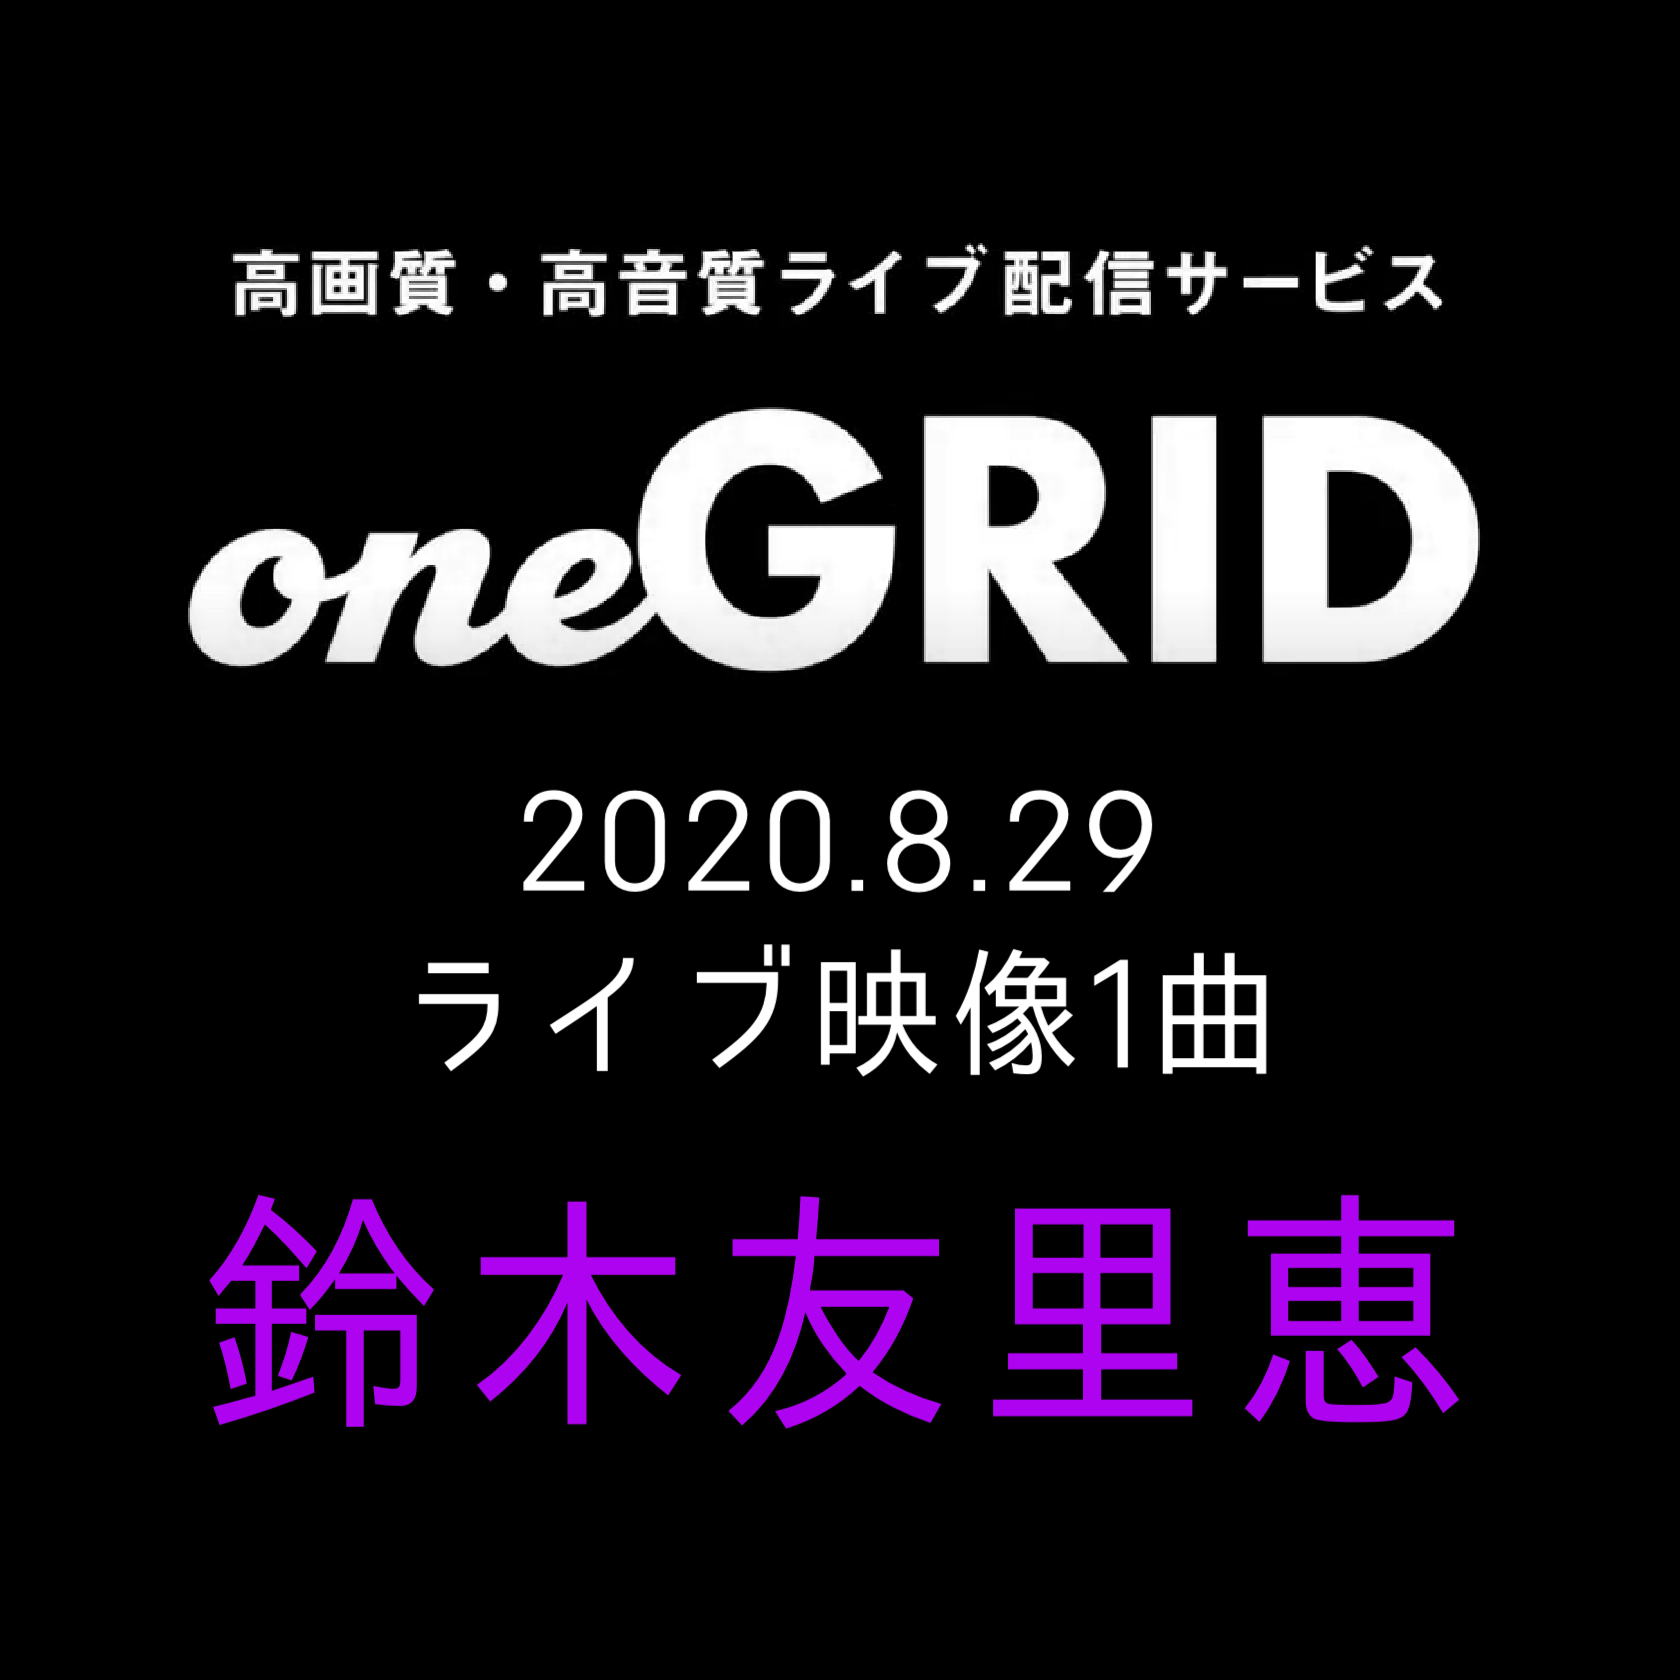 8/29鈴木友里恵ライブ映像